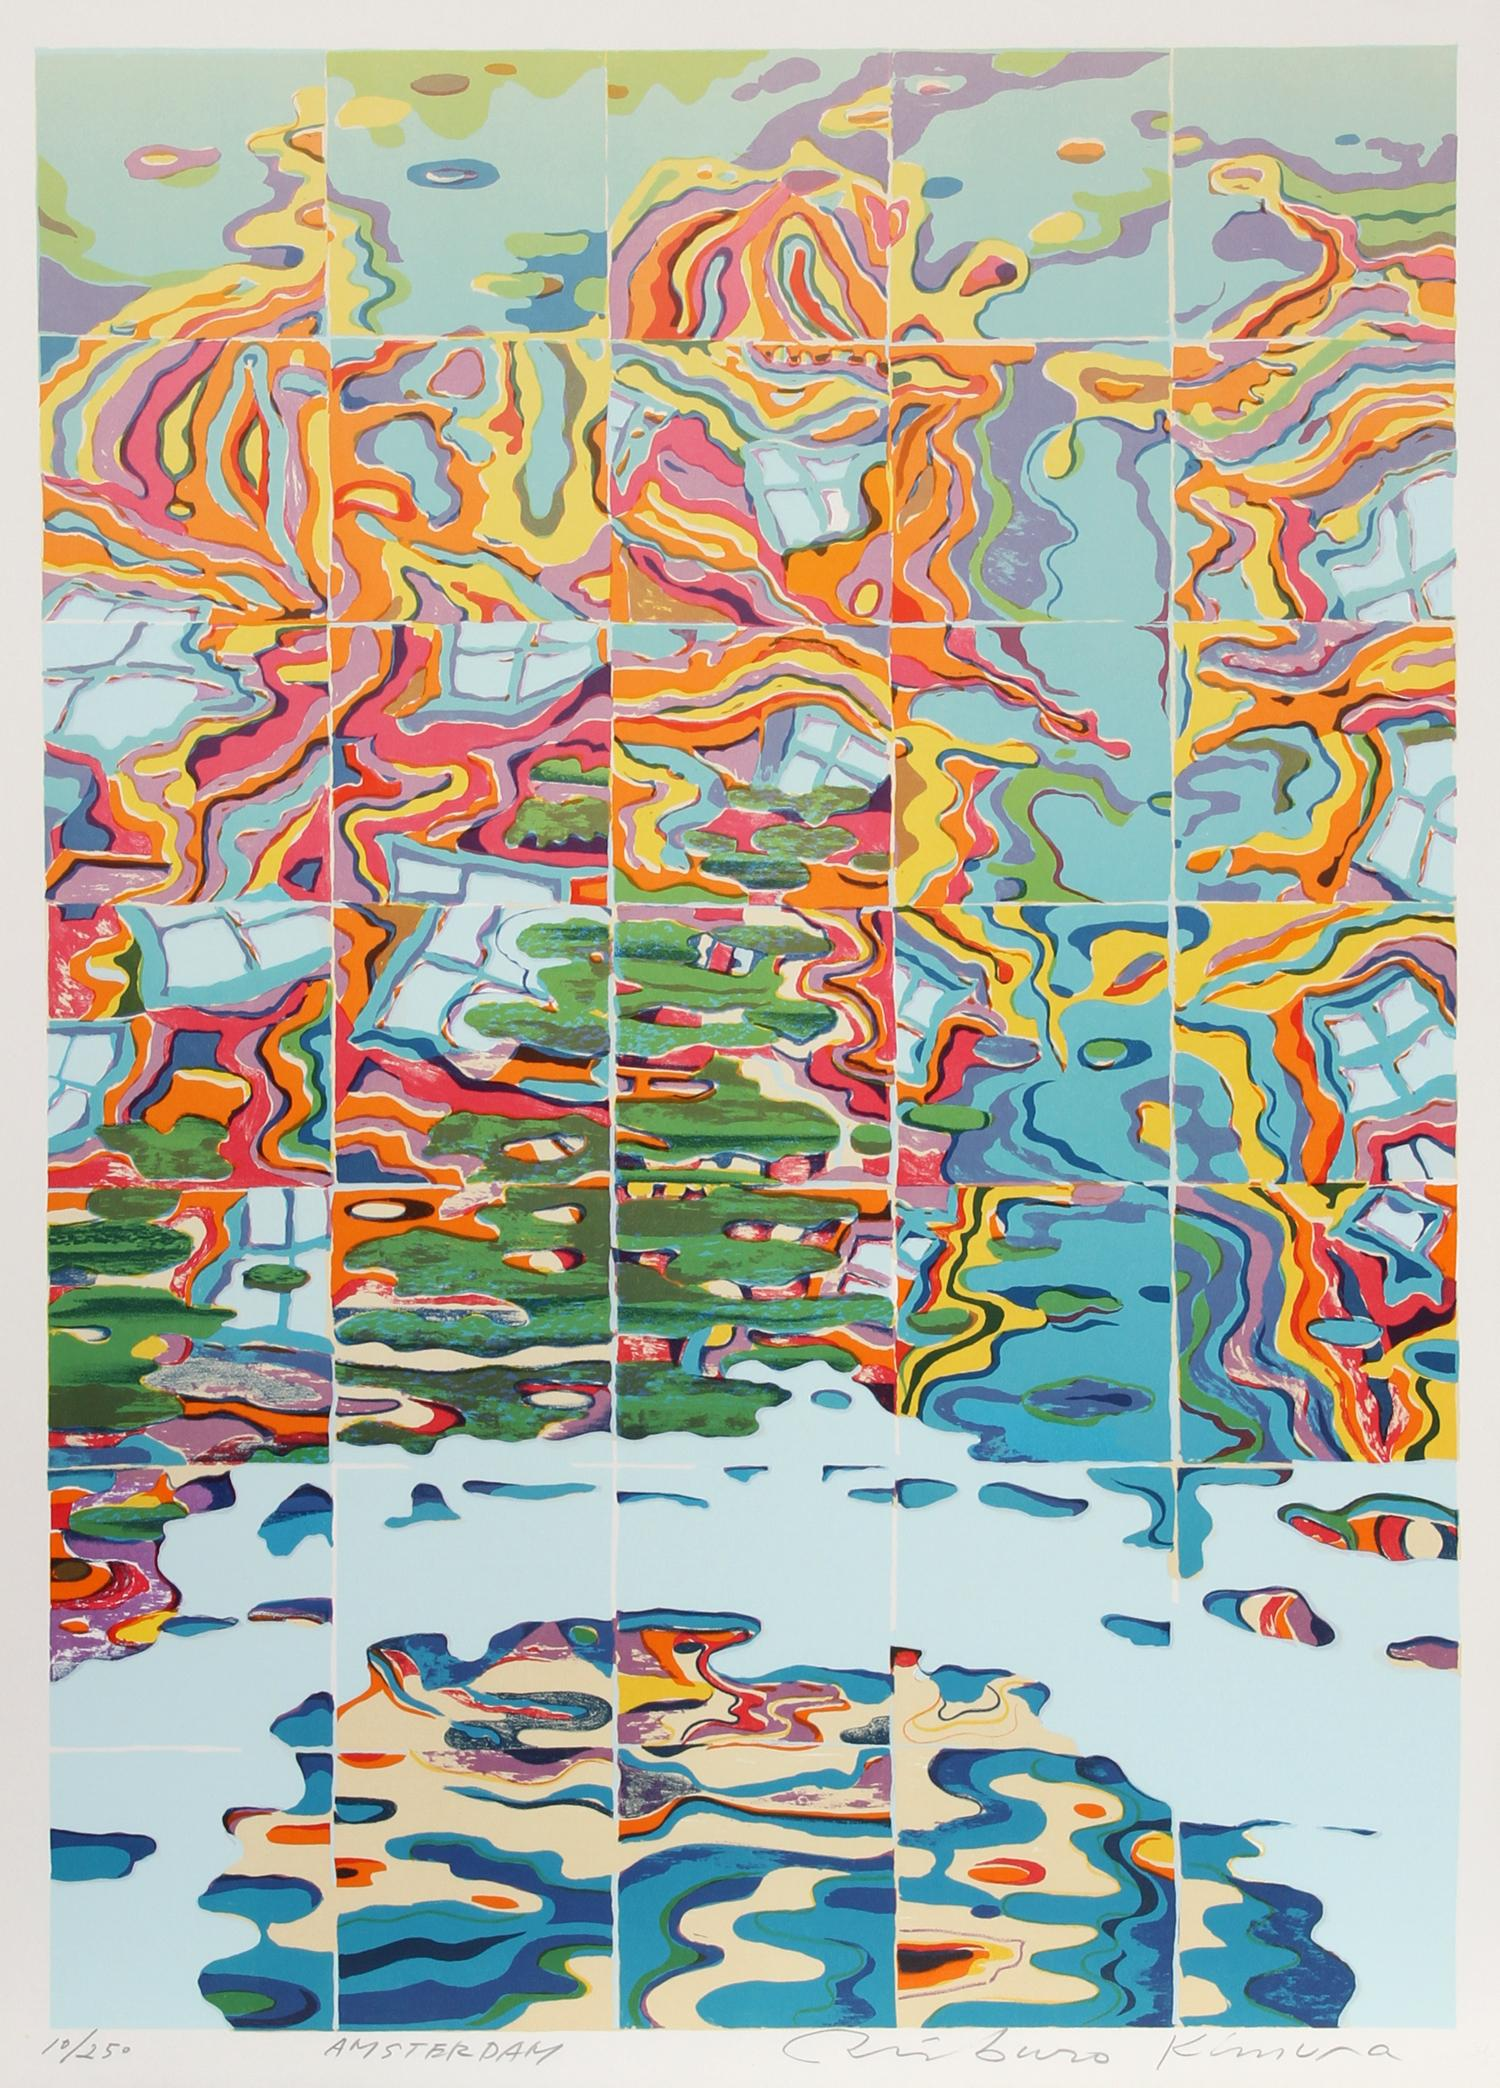 Amsterdam, 1973 Silkscreen by Risaburo Kimura